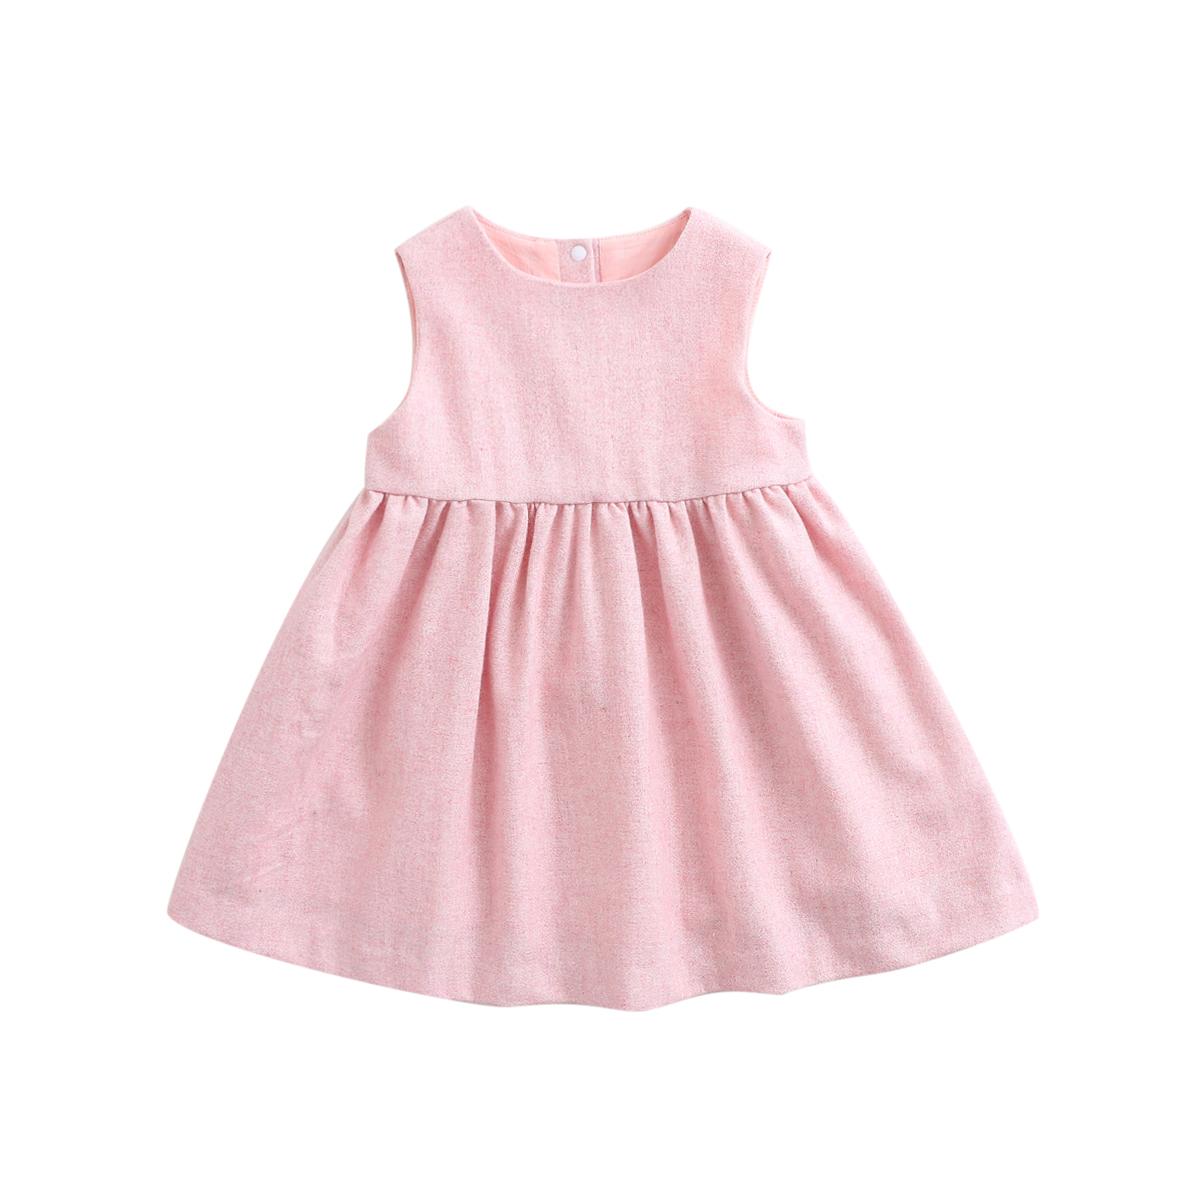 marcjanie马克珍妮新款秋装女童羊毛混纺连衣裙 宝宝羊毛裙70095